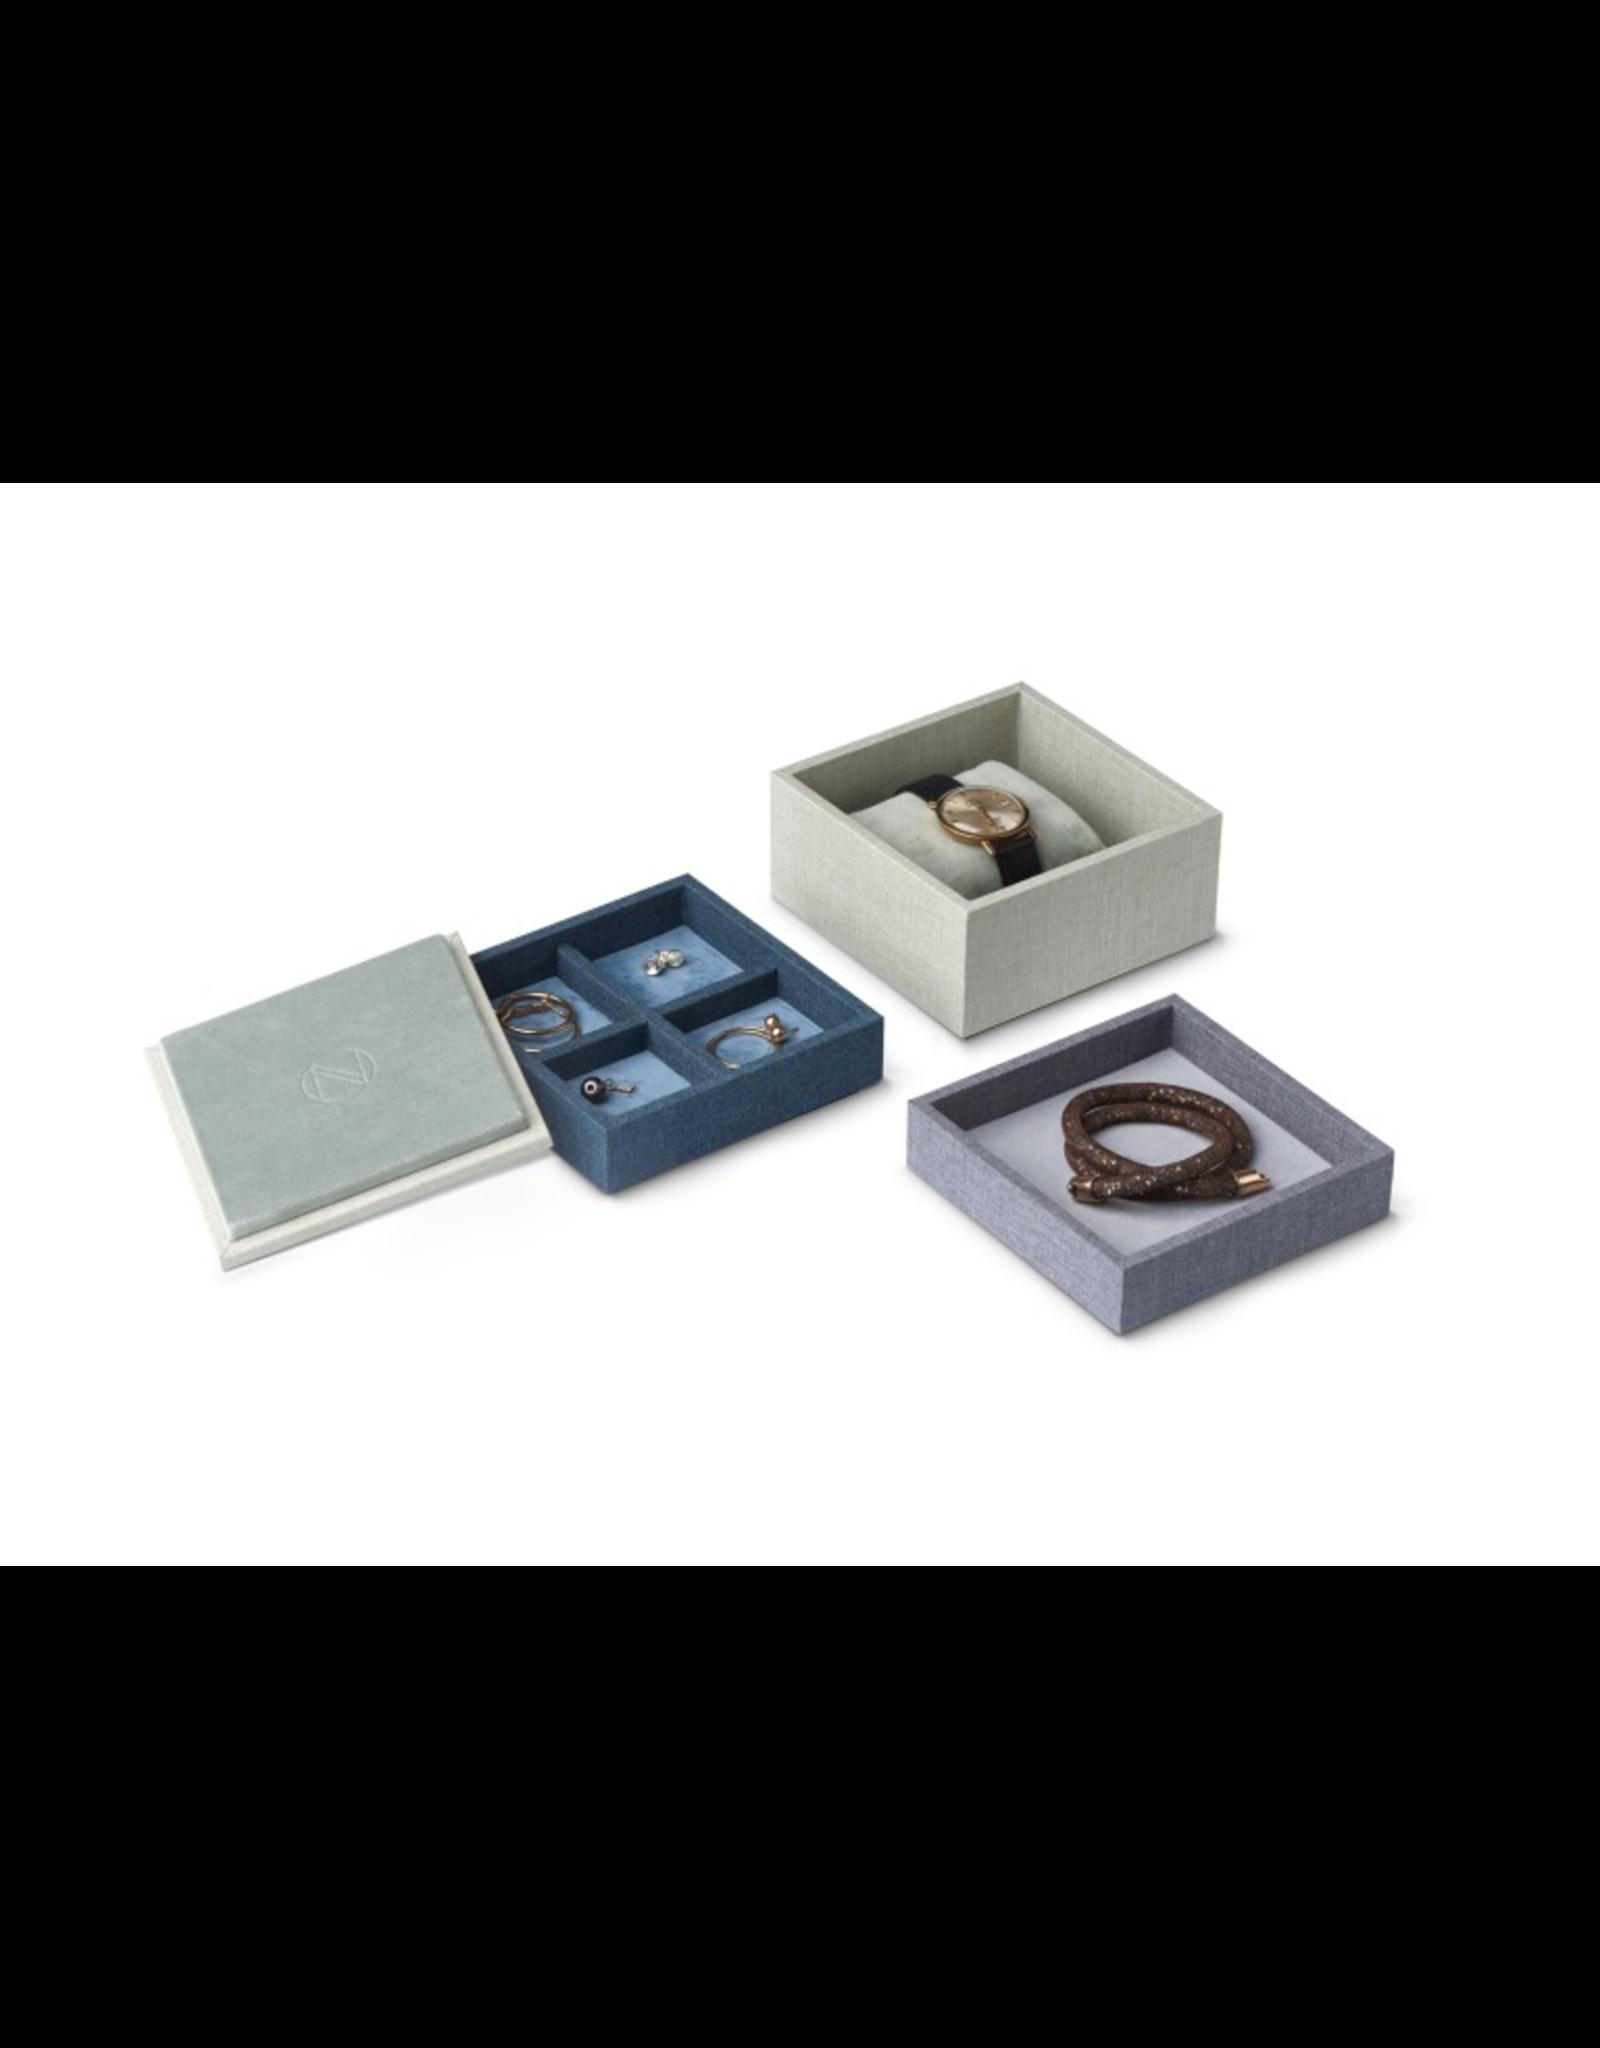 Juwelen STACK Coffret à bijoux S 3pcs - Bleu / Vert / Gris